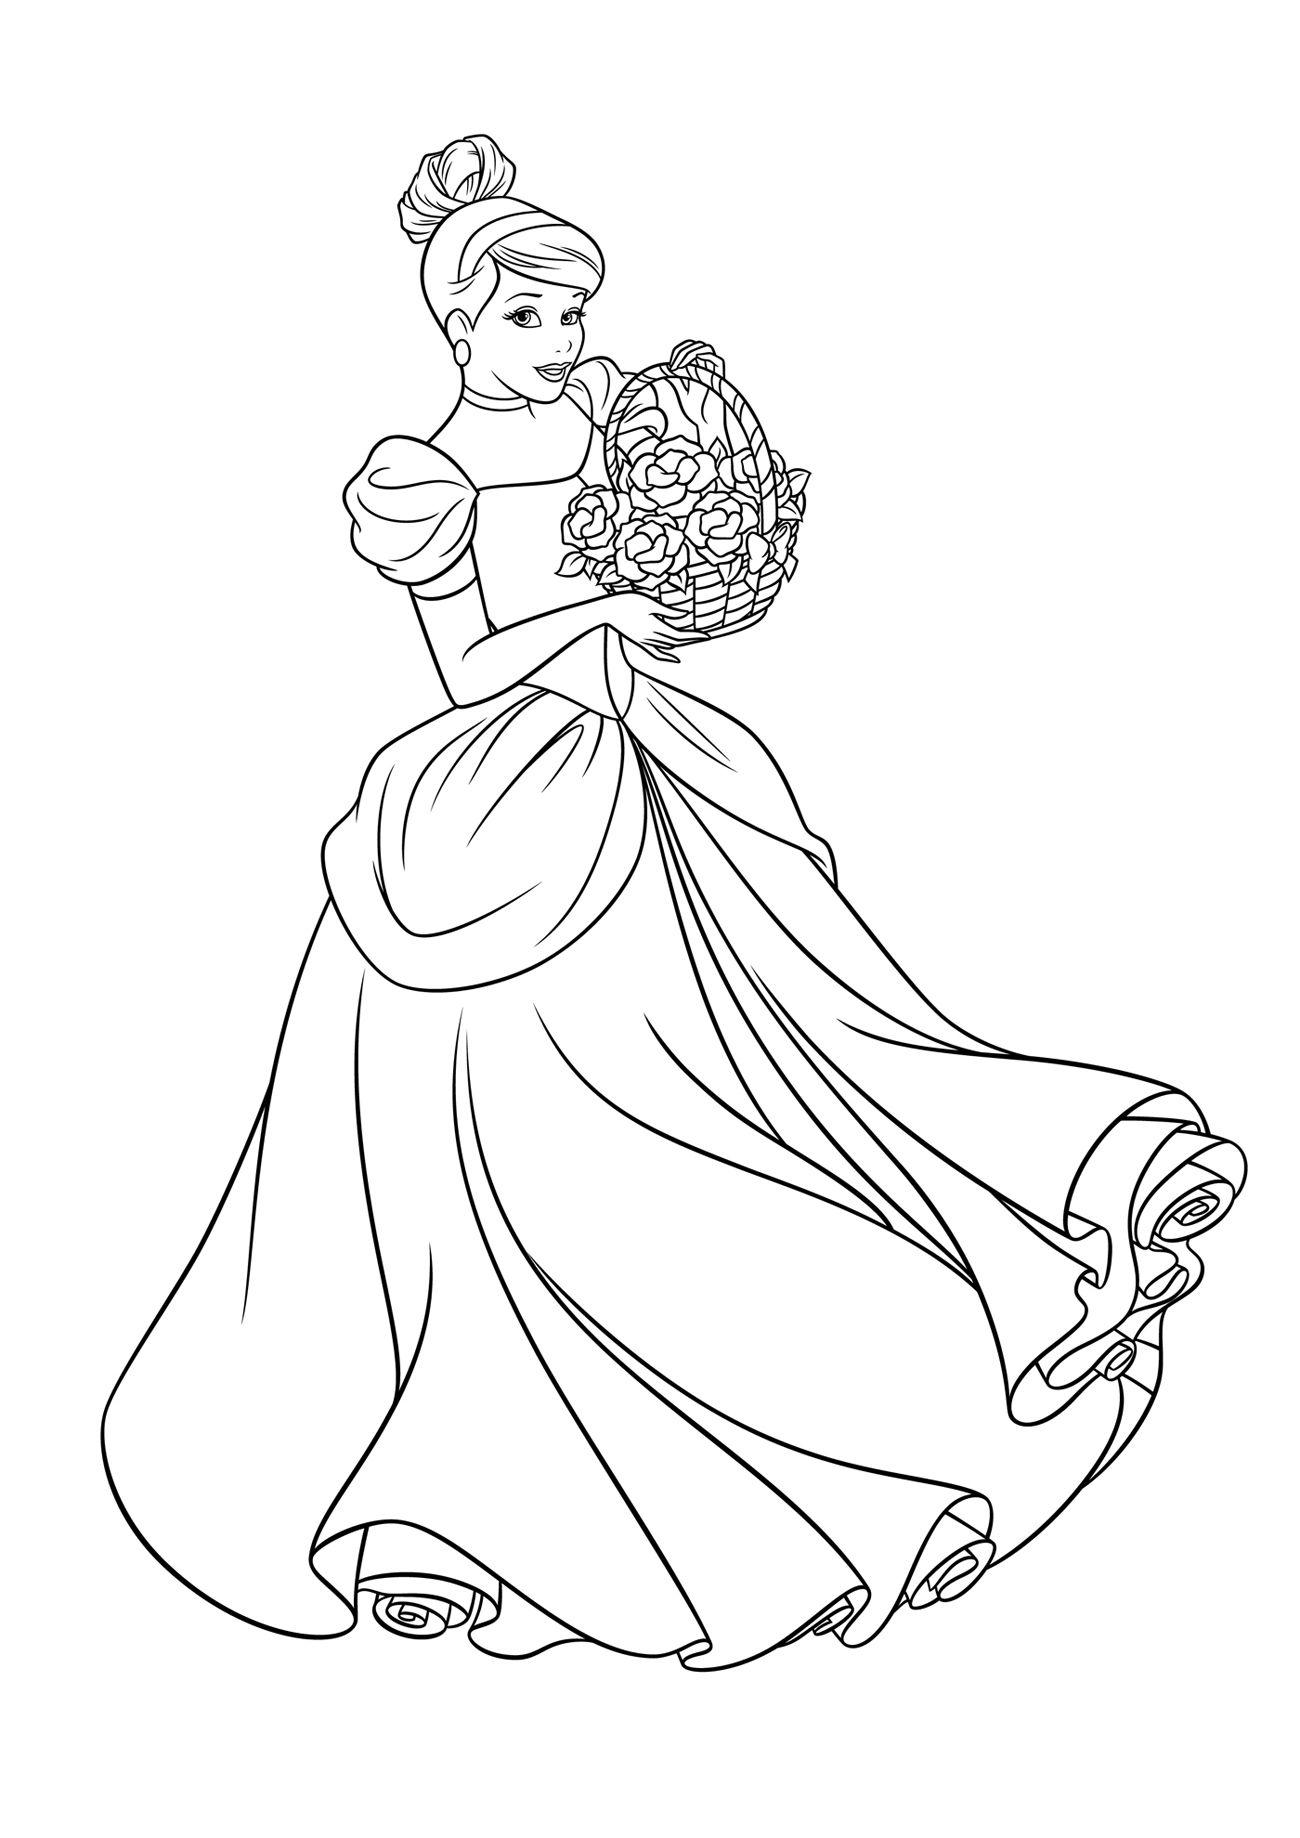 pinkantana pinjai on color  cinderella coloring pages